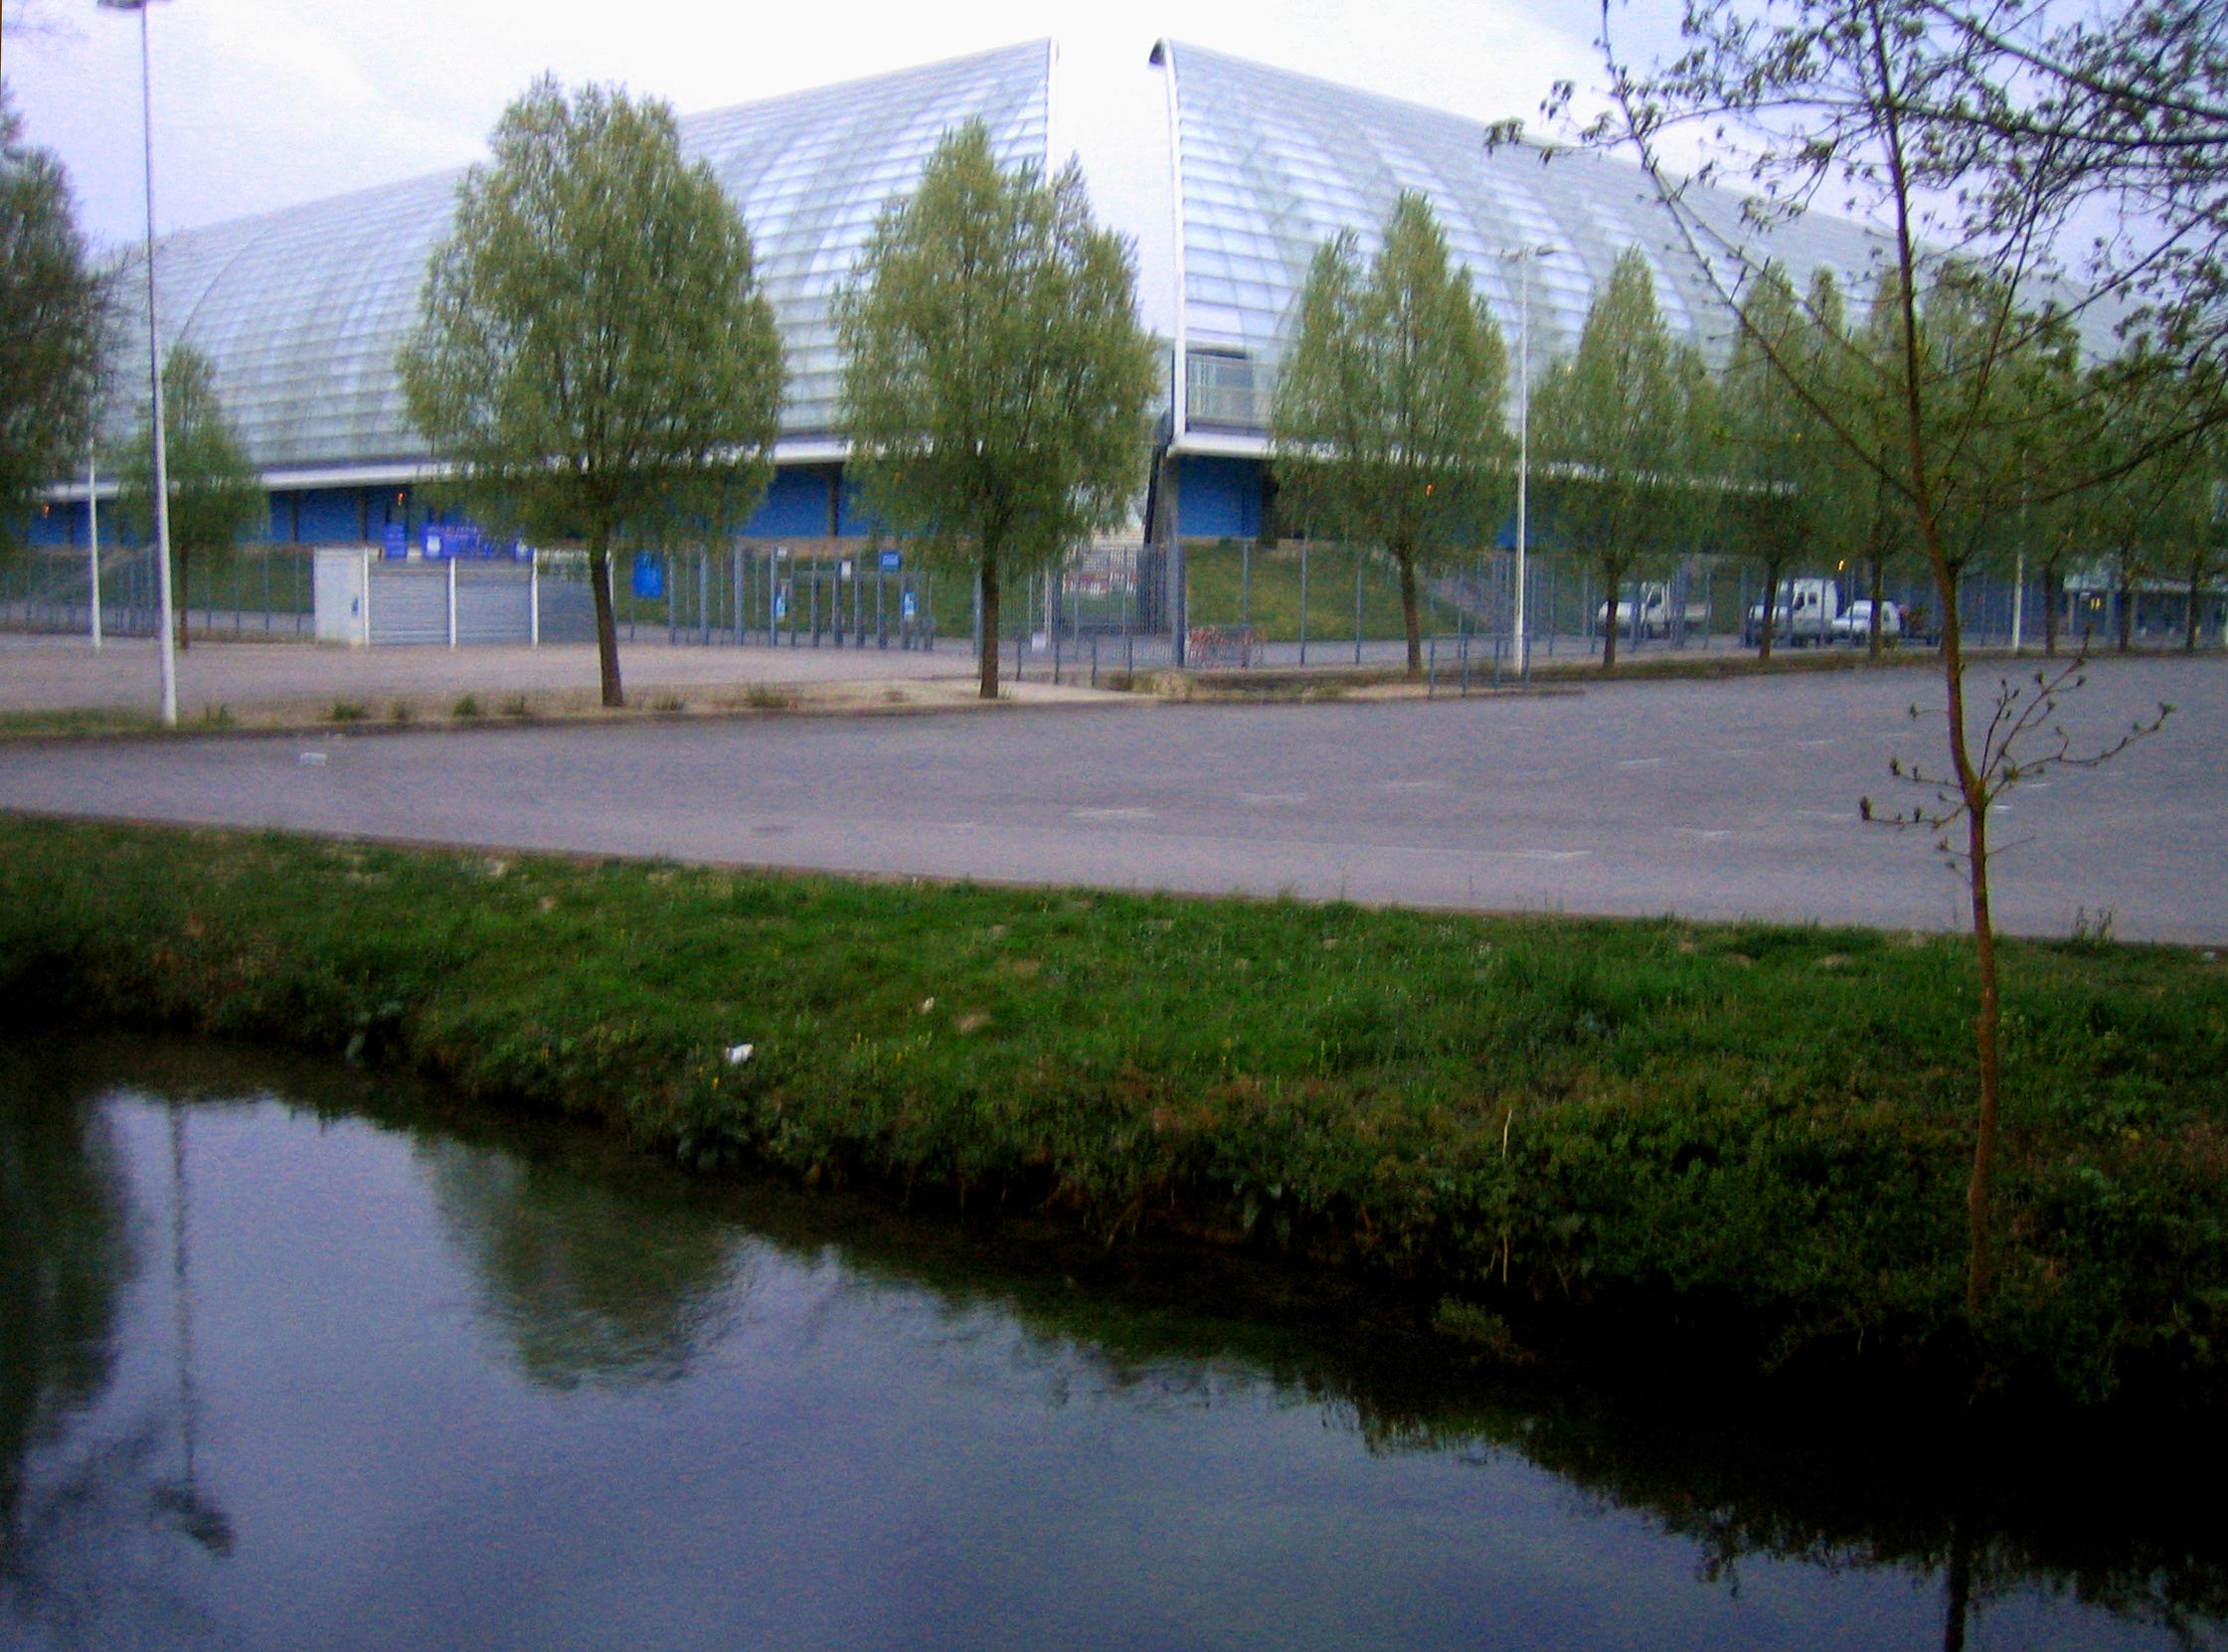 http://upload.wikimedia.org/wikipedia/commons/3/3e/Amiens_Renancourt_stade_de_la_Licorne_1.jpg